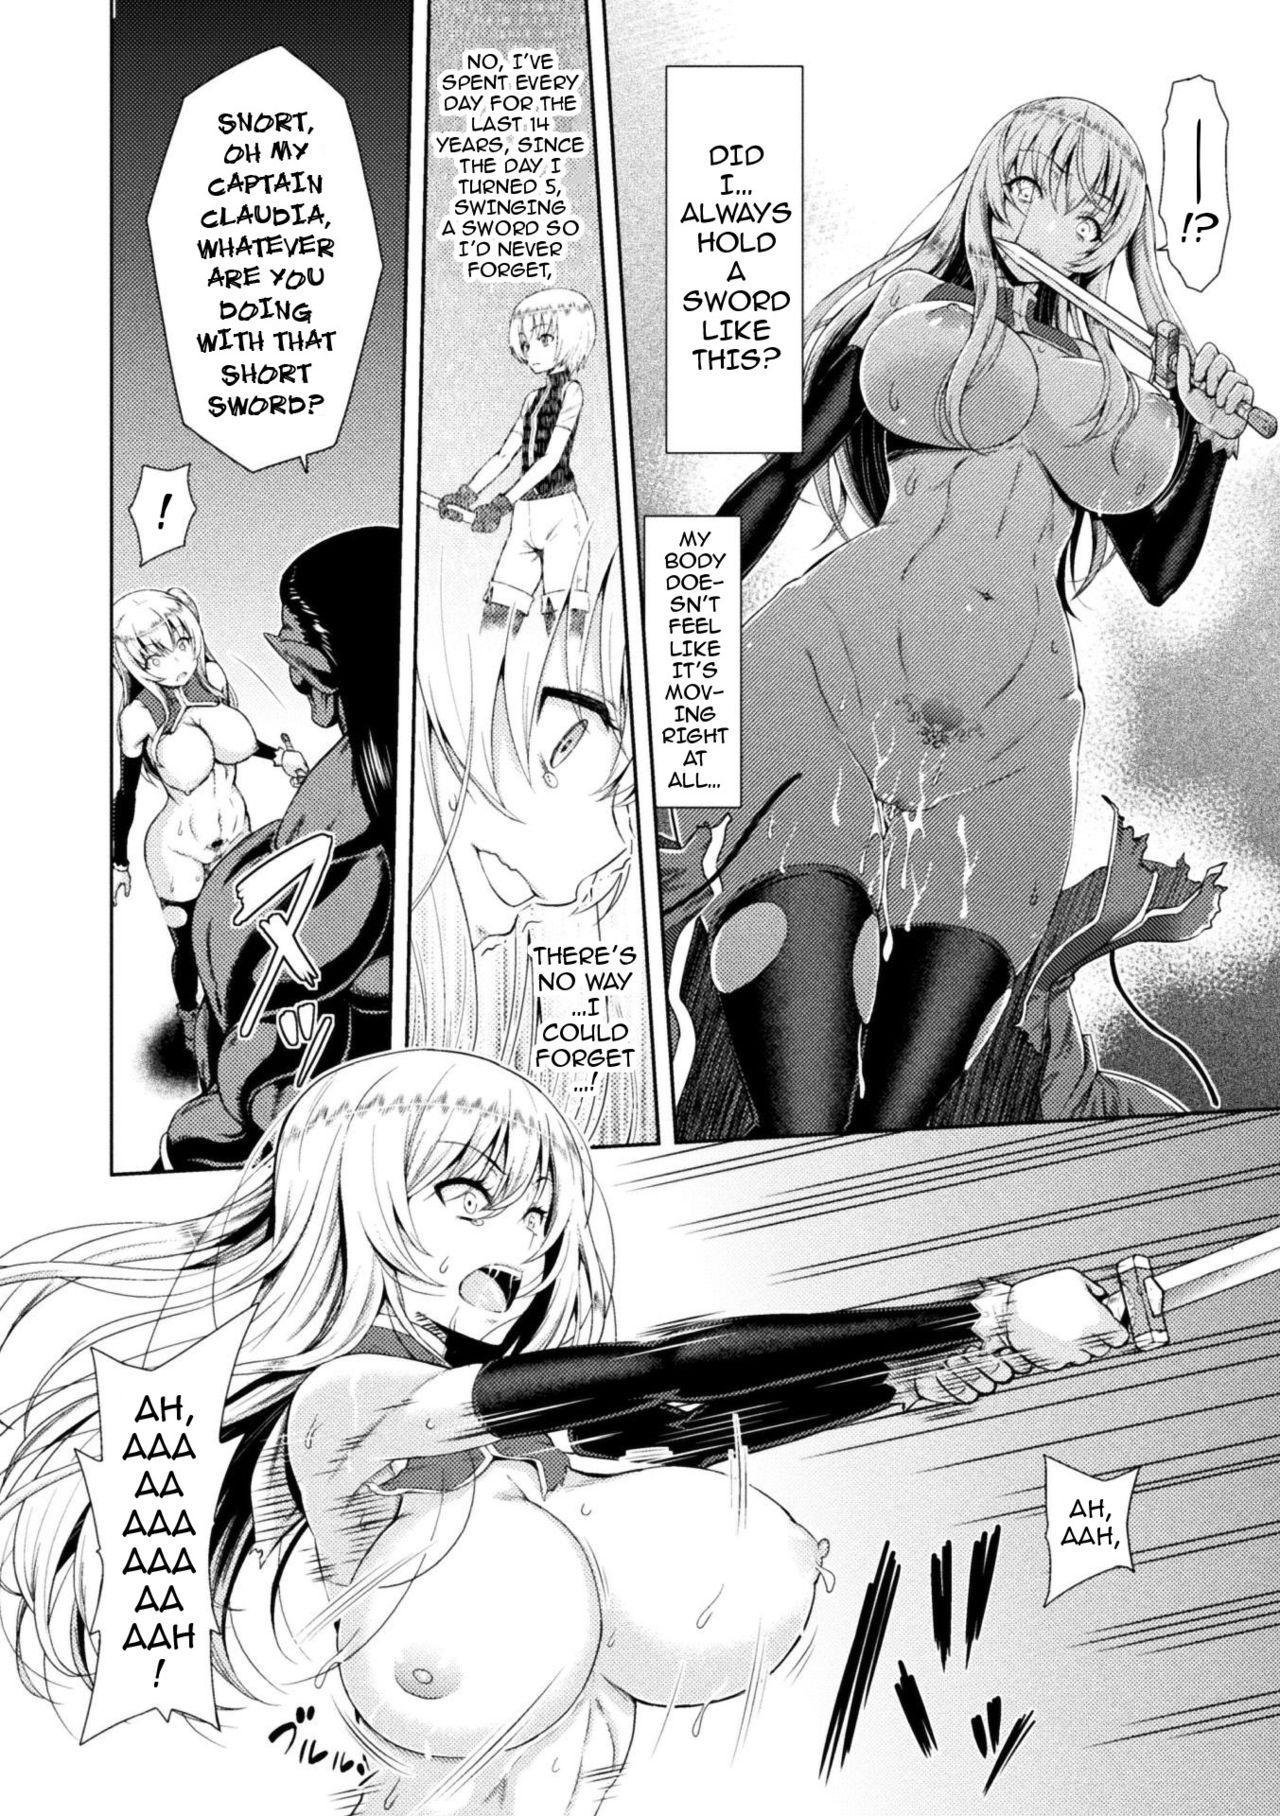 [Yamada Gogogo] Erona ~Orc no Inmon ni Okasareta Onna Kishi no Matsuro~   Erona ~The Fall of a Beautiful Knight Cursed with the Lewd Mark of an Orc~ Ch. 1-6 [English] {darknight} 42